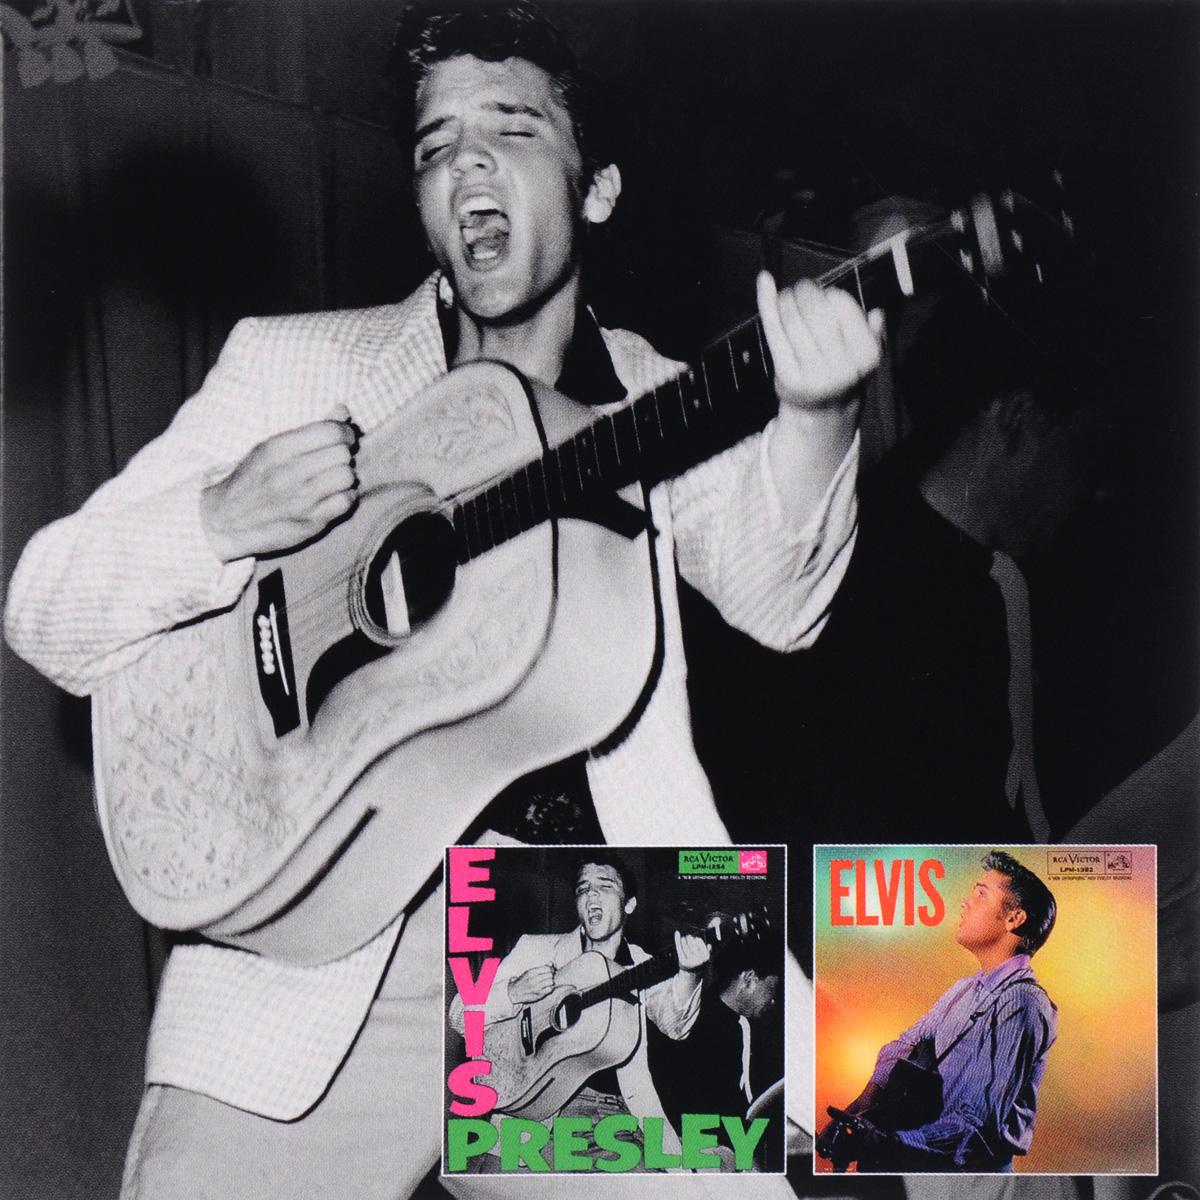 цена на Элвис Пресли Elvis Presley. Elvis Presley / Elvis (2 CD)